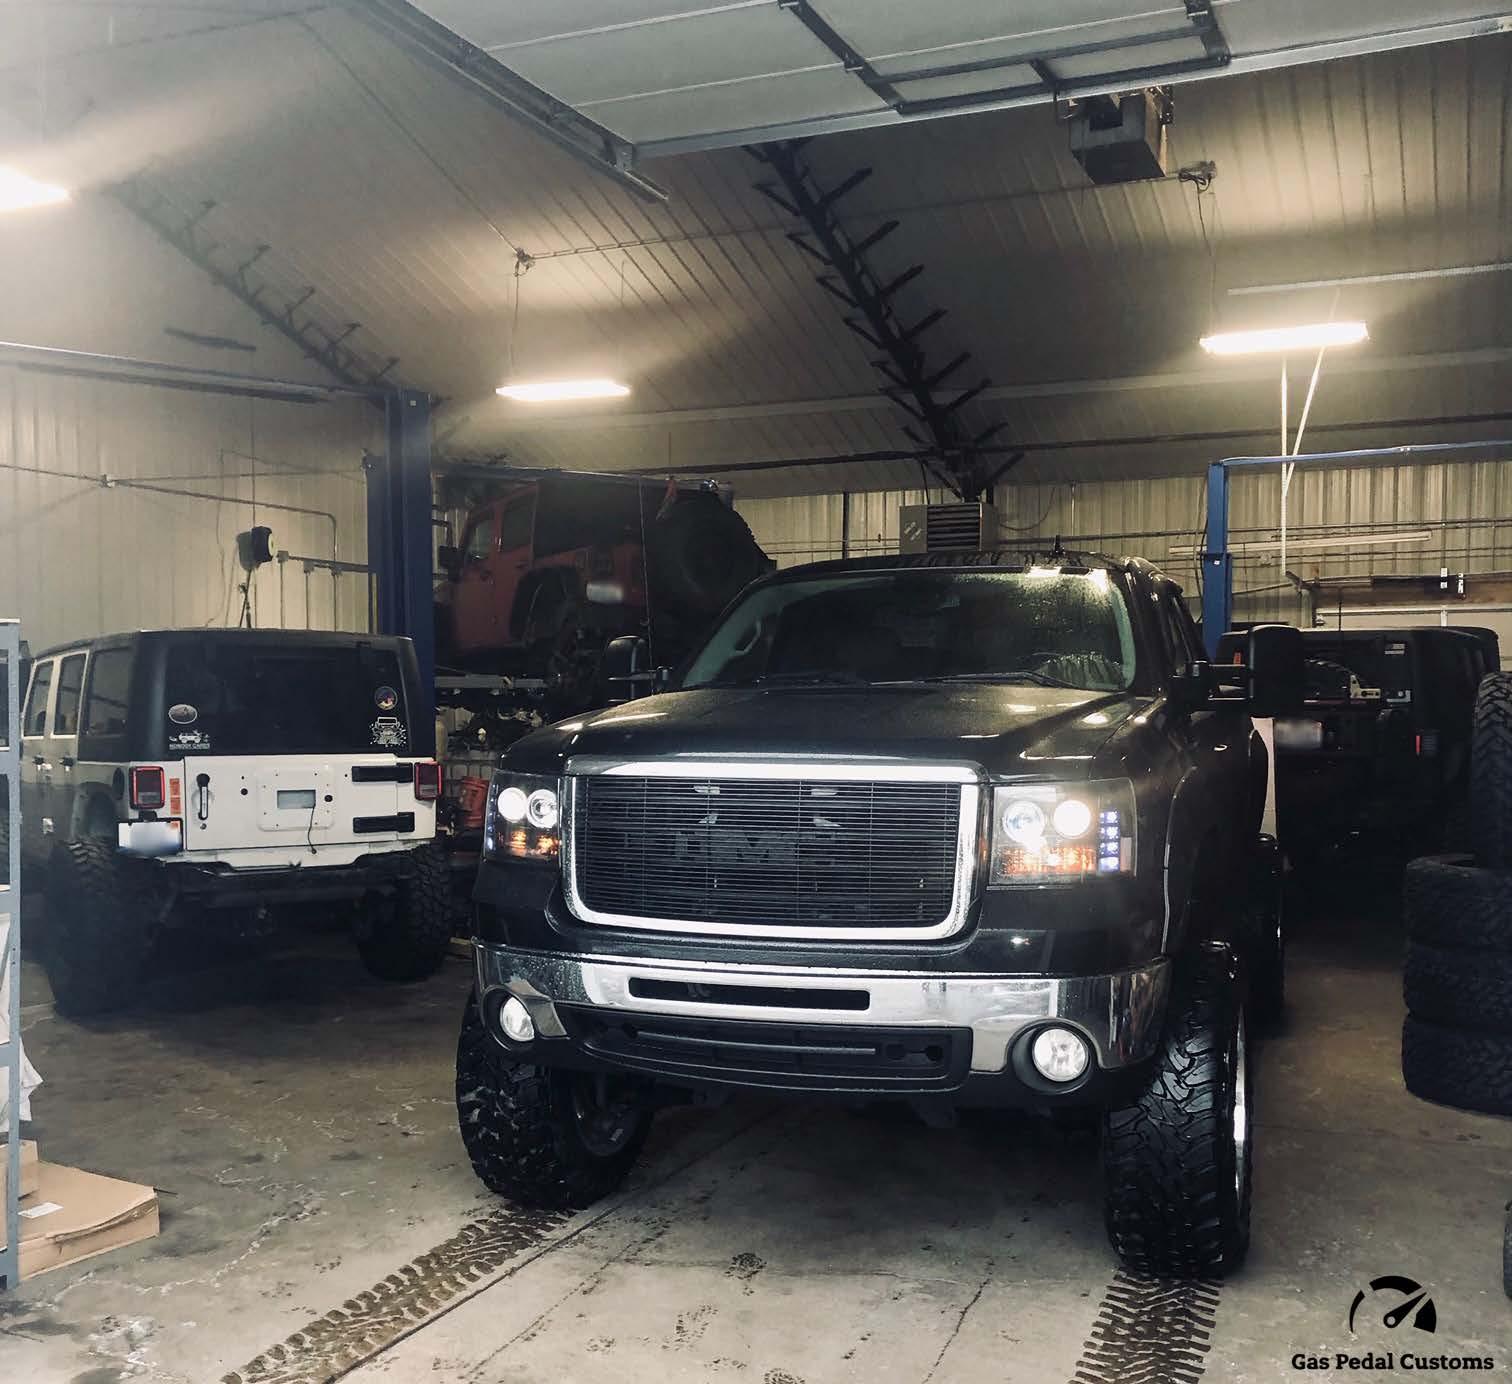 Automotive Jobs West Michigan - Gas Pedal Customs Careers